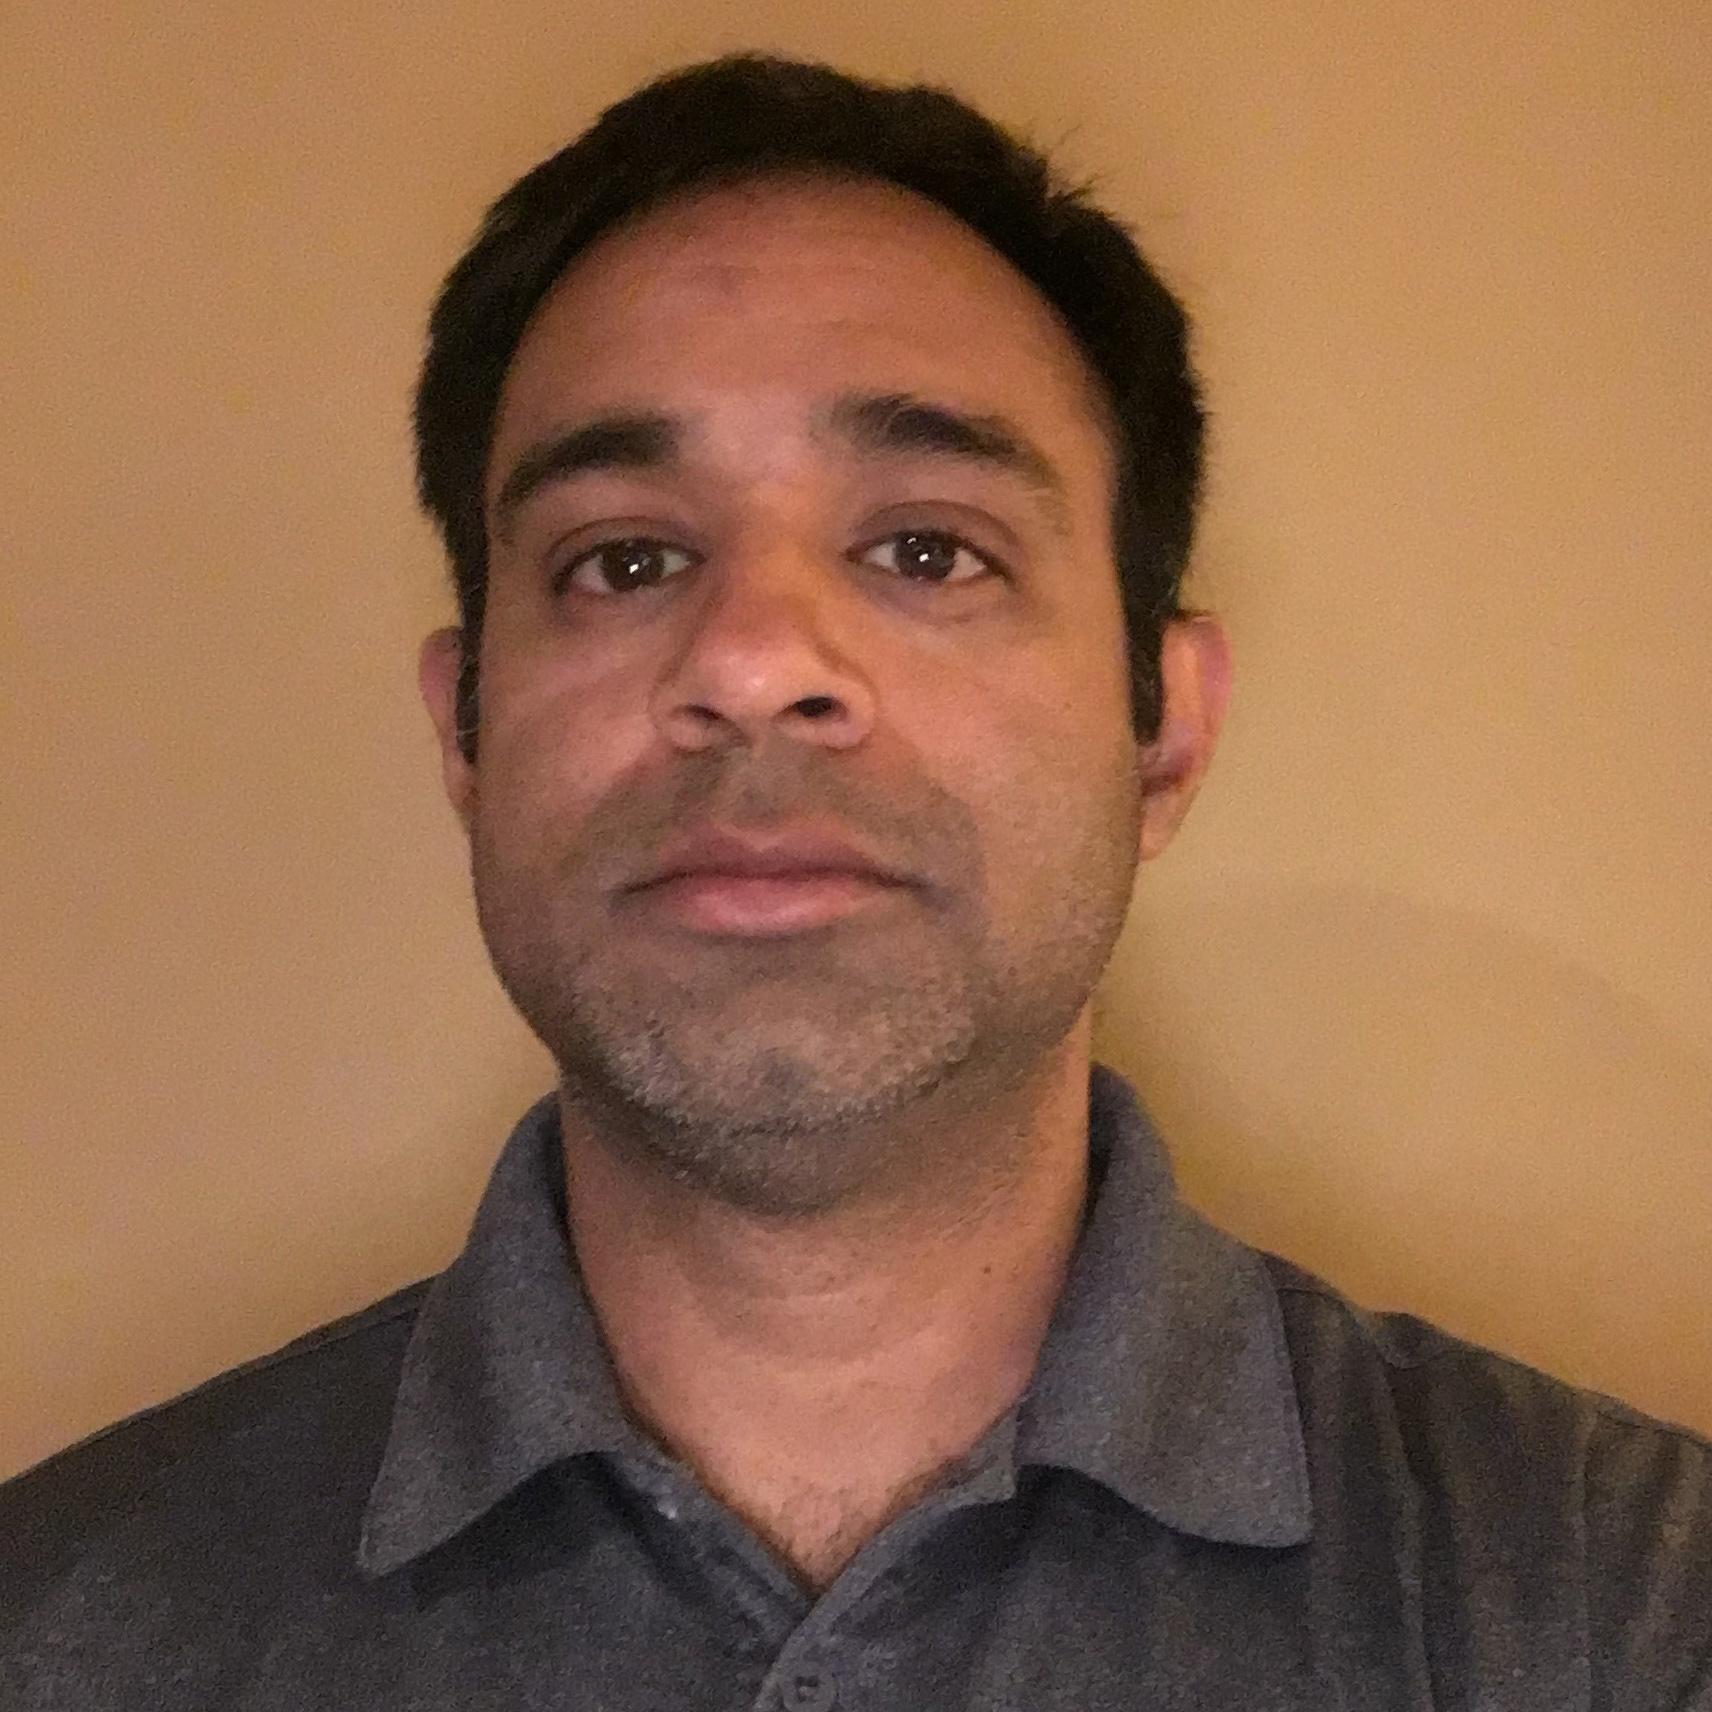 Ali Husain